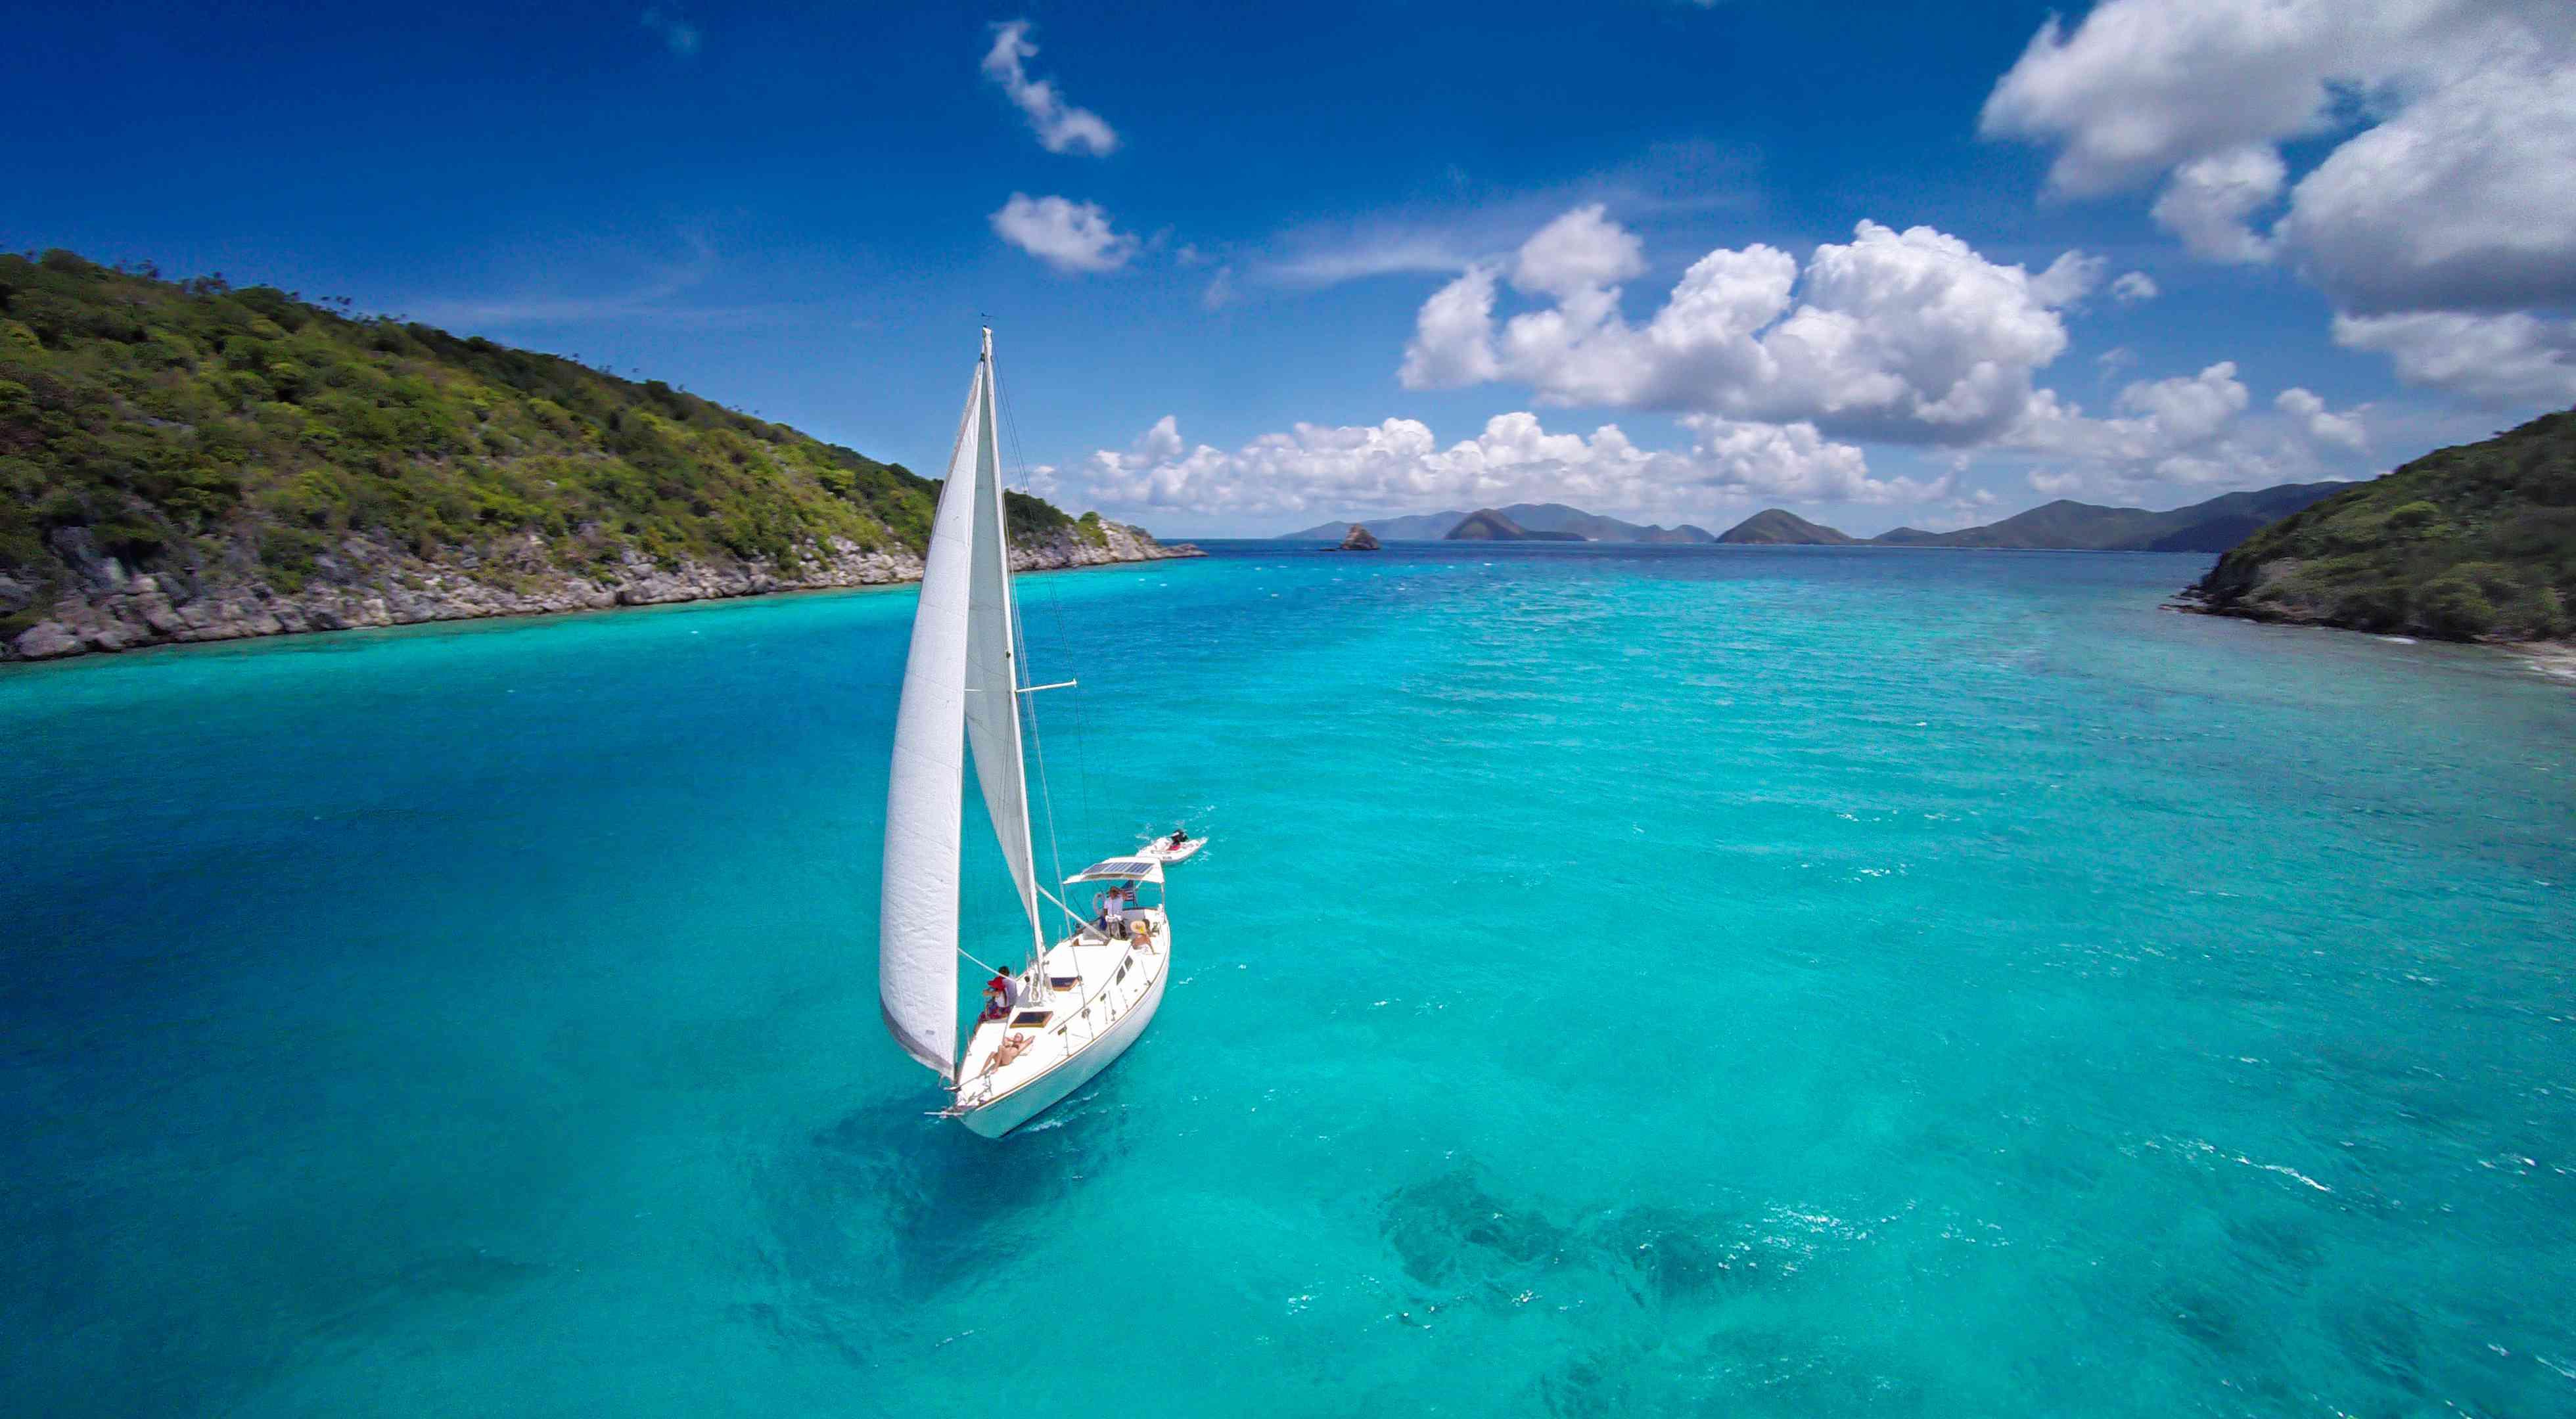 aerial view of a sloop sailing through the Caribbean